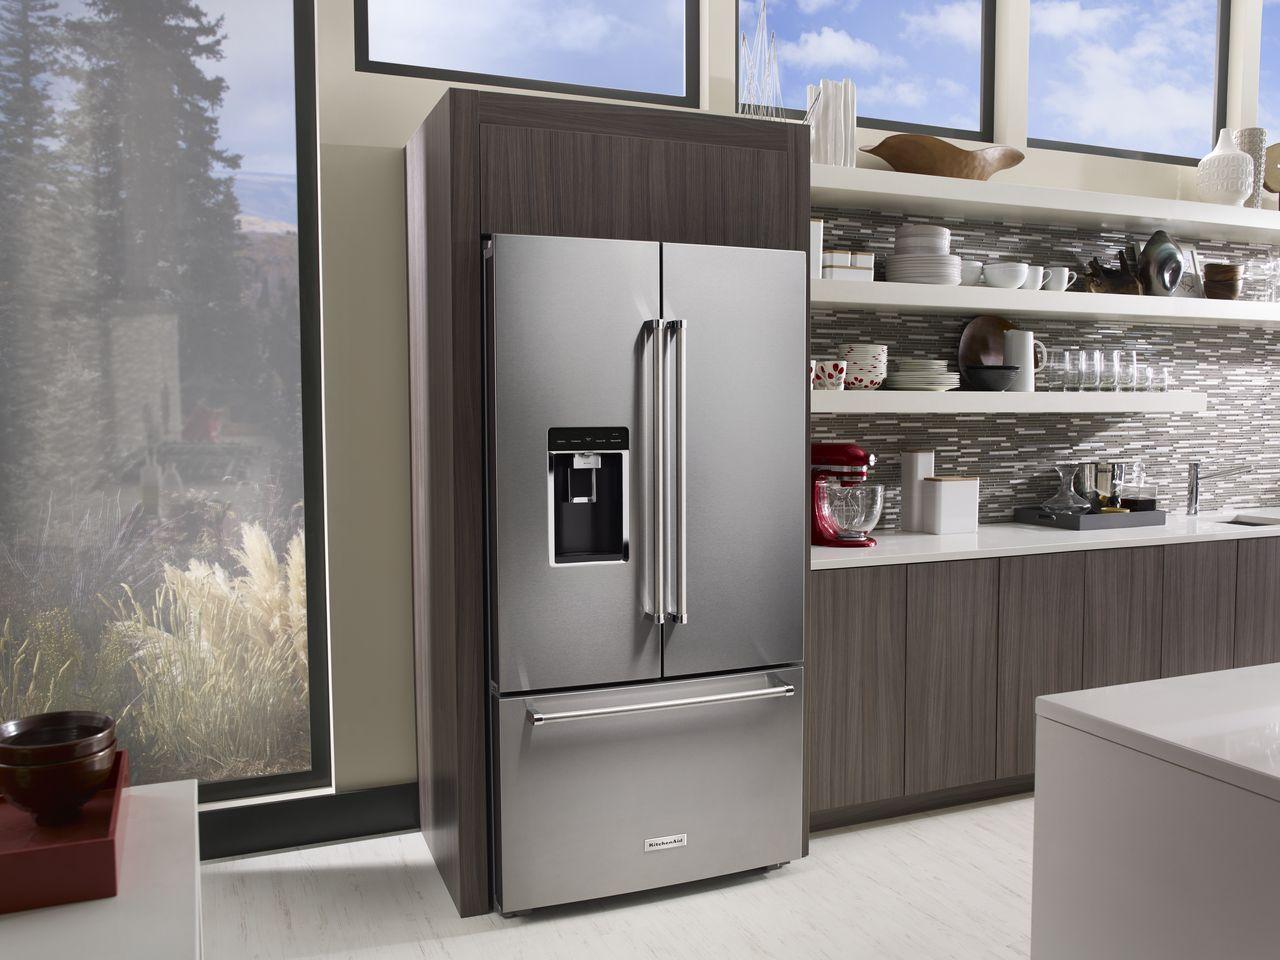 The big threedoor fridge by KitchenAid  Home Appliances